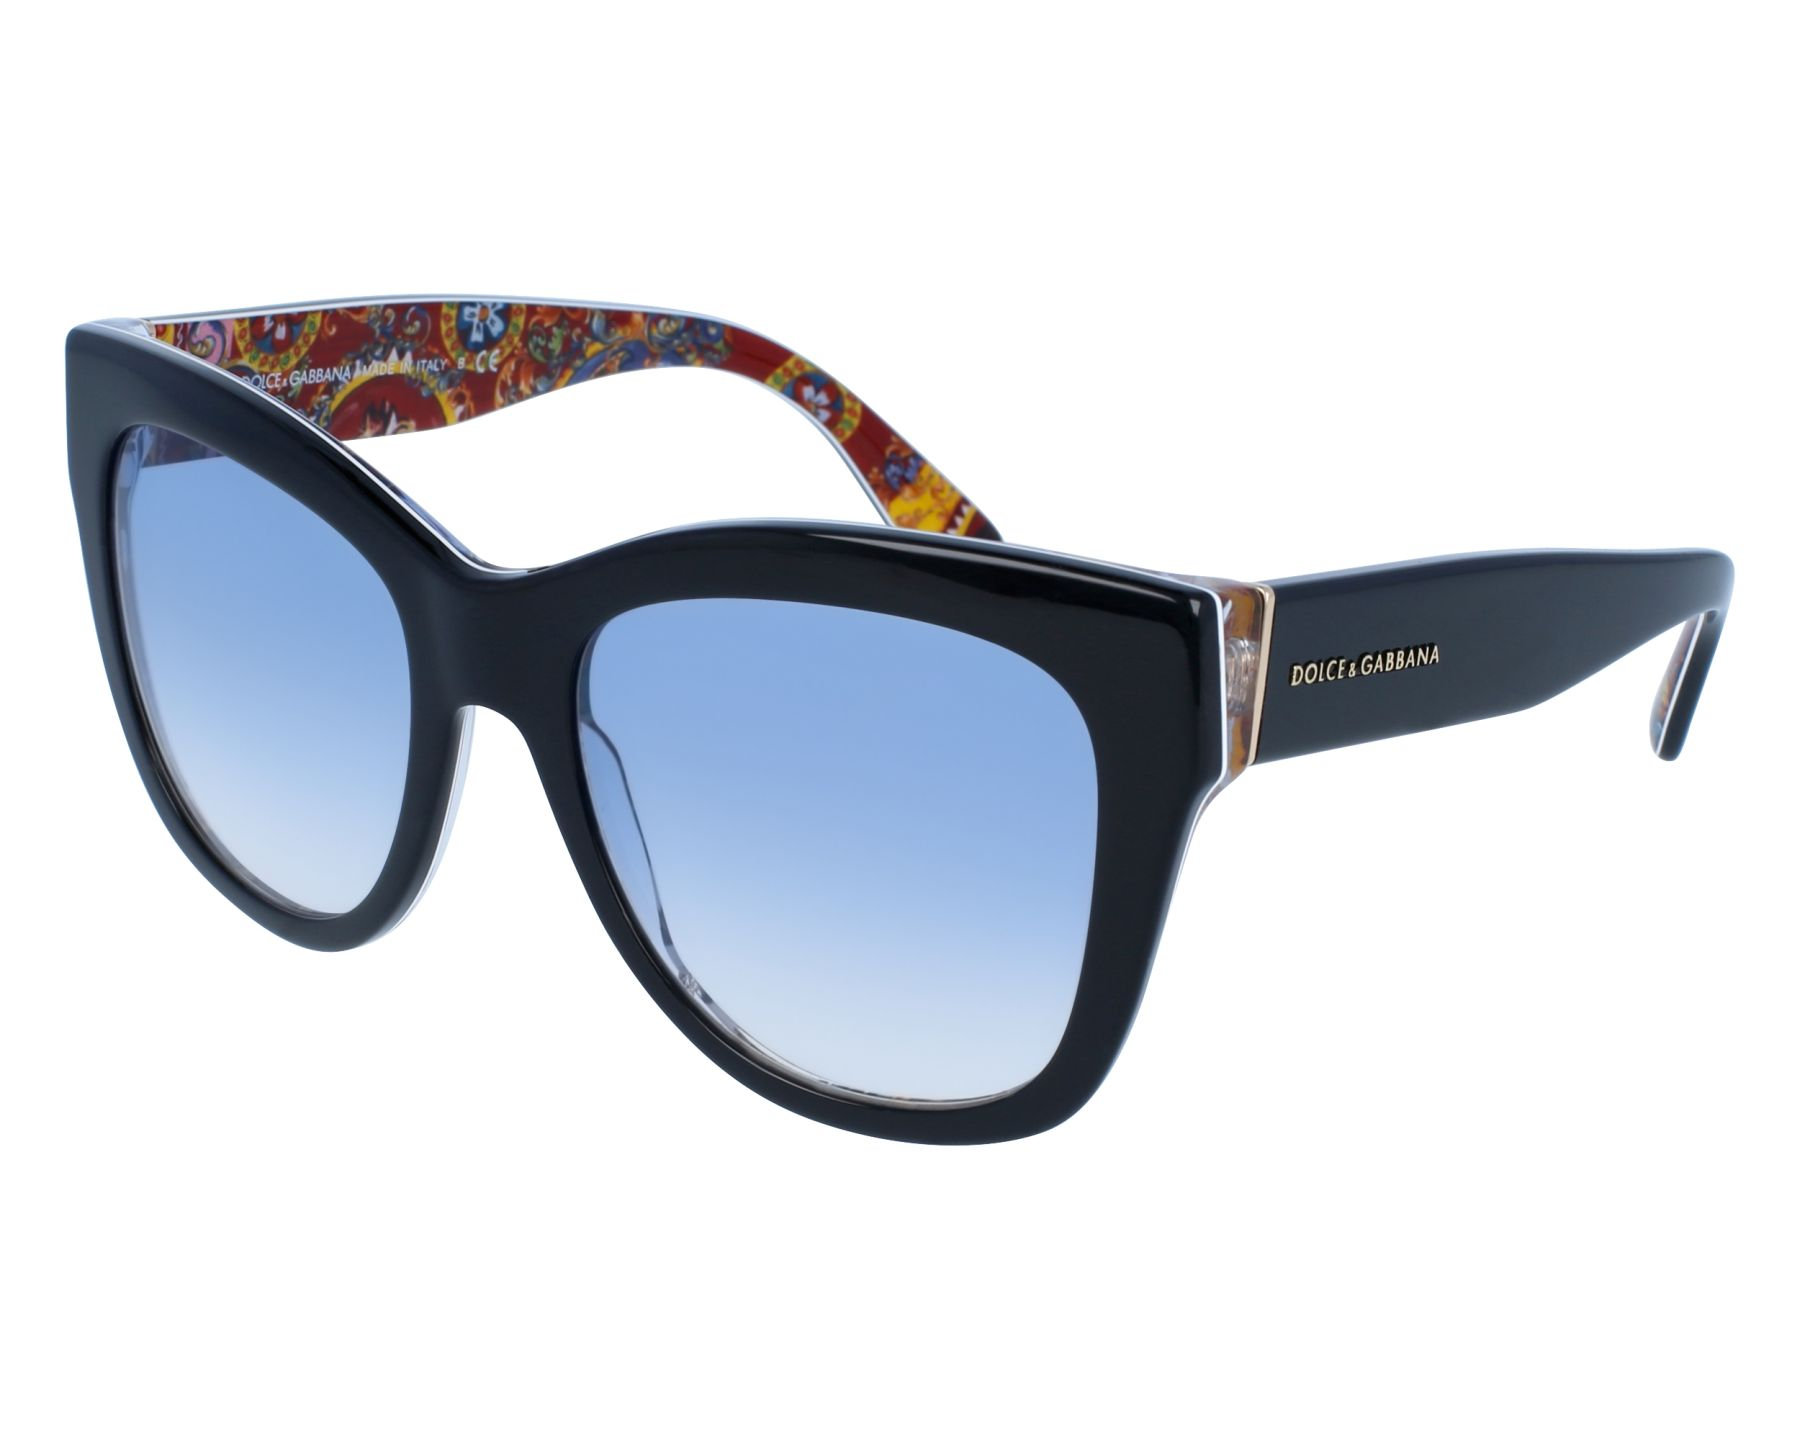 77e9e3ac5 thumbnail Sunglasses Dolce & Gabbana DG-4270 3033/19 - Black Red front view